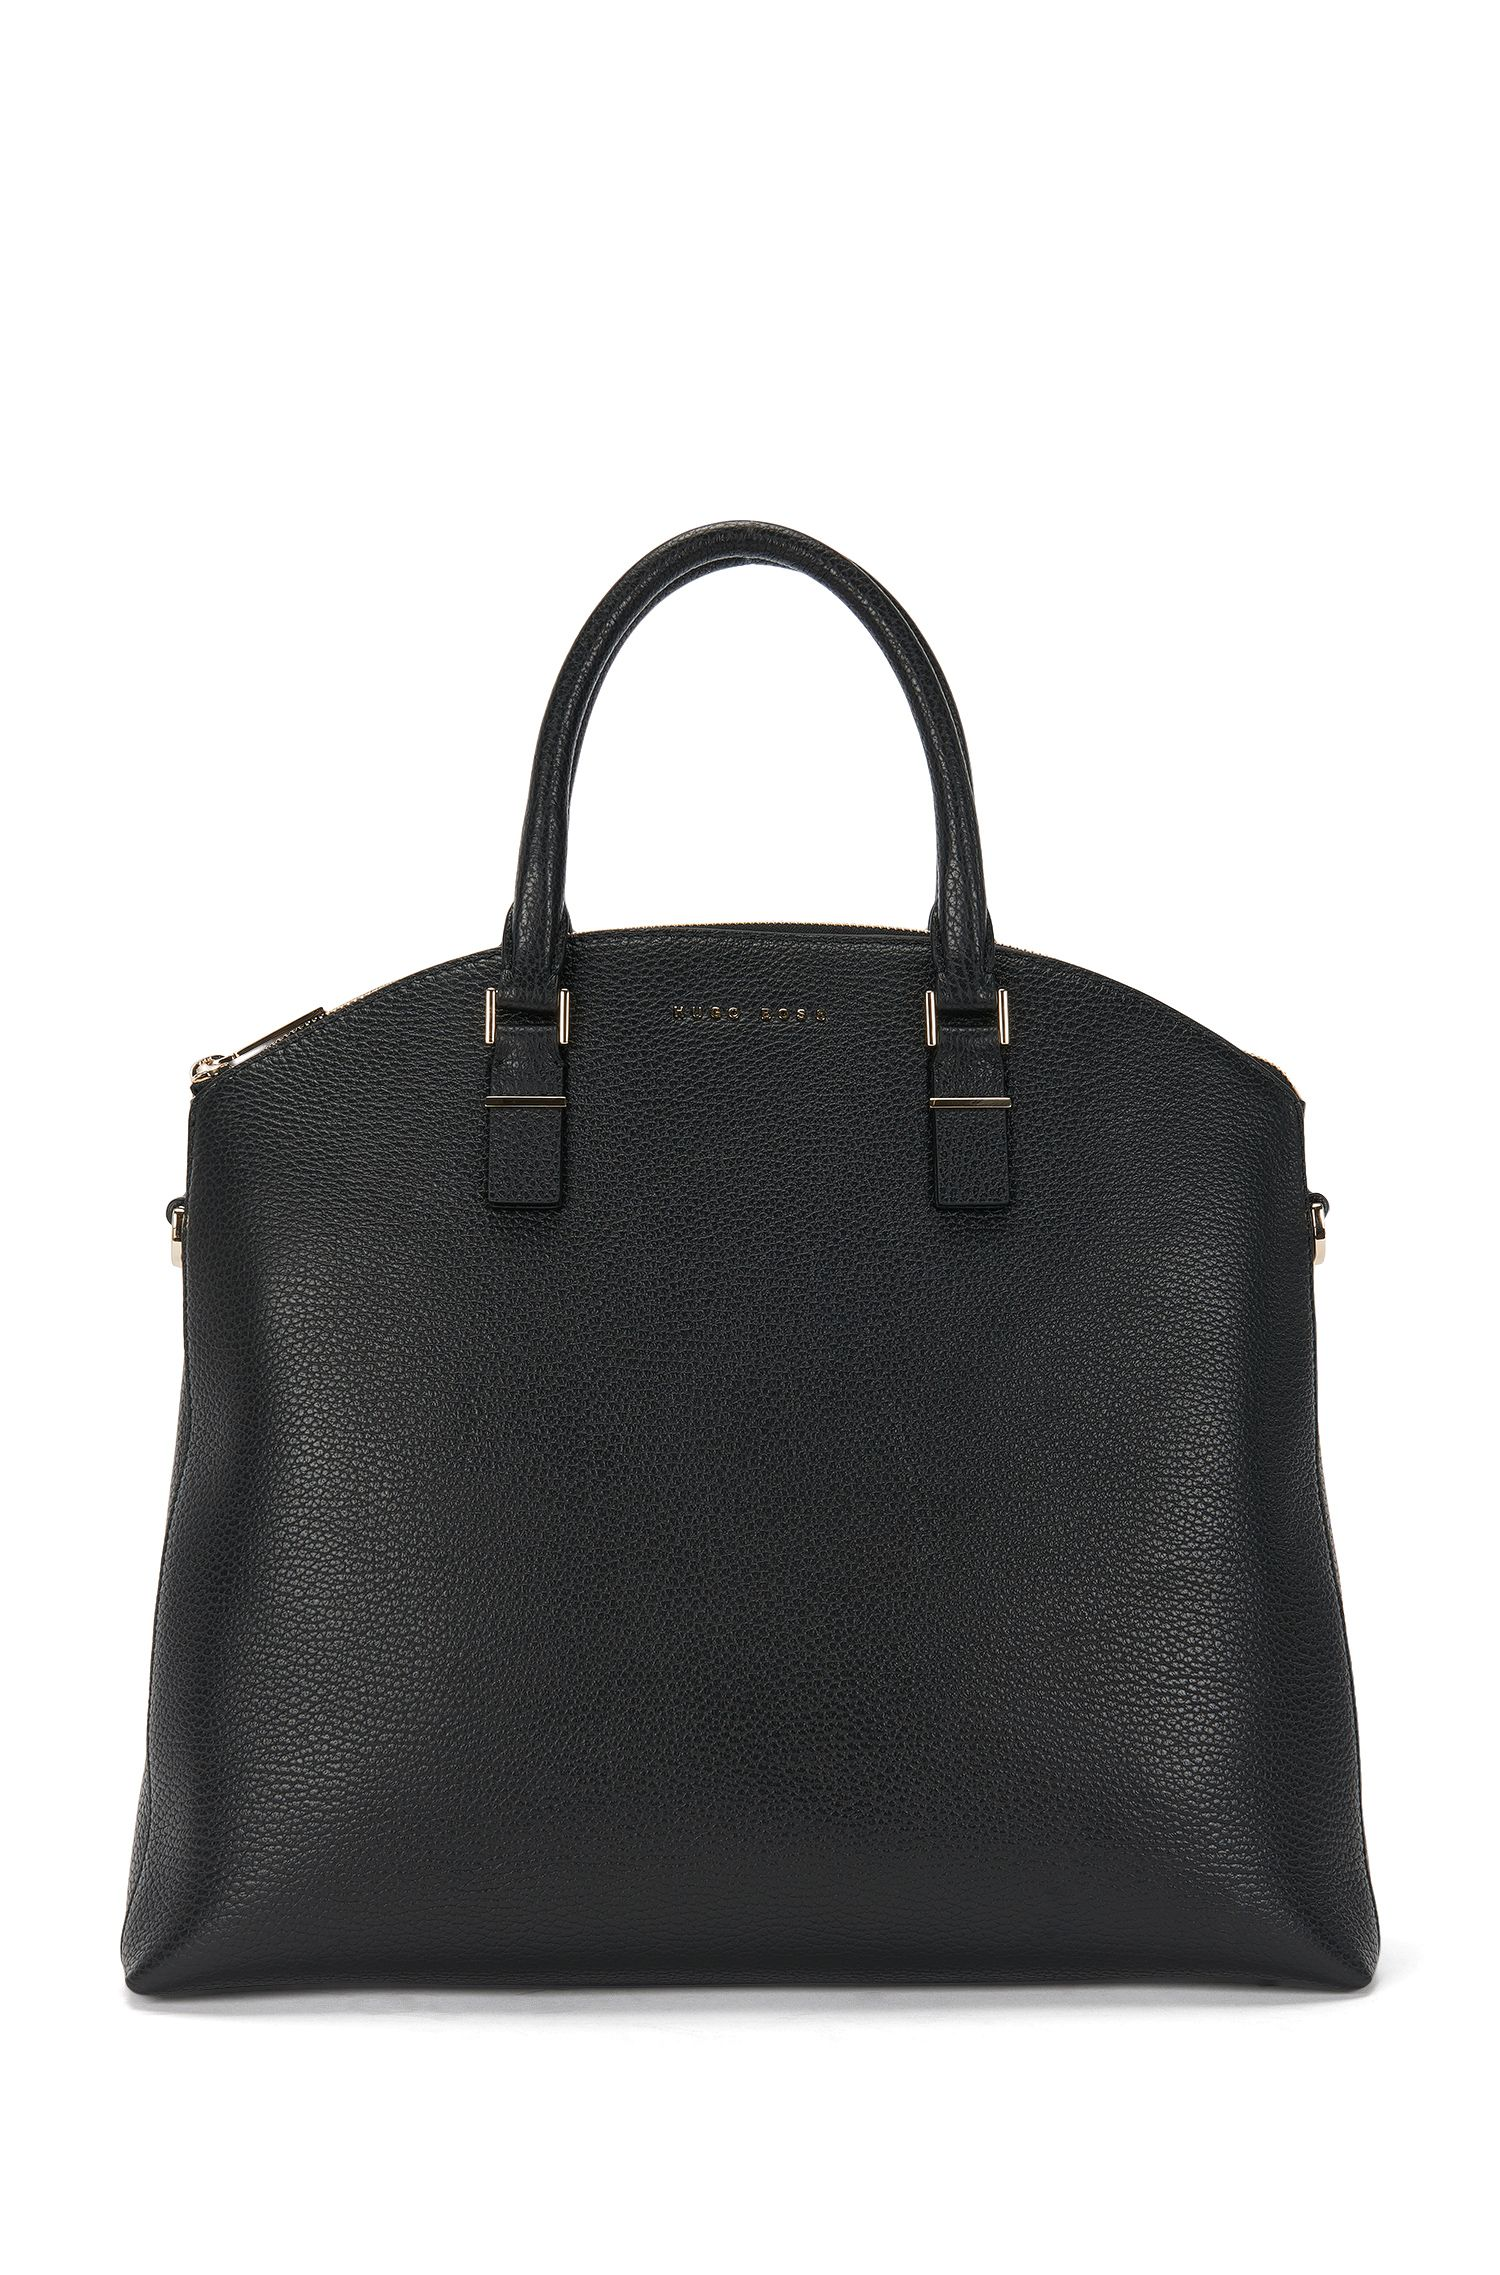 'Luxury S. Bugatti' | Leather Grained Shopper Handbag, Detachable Shoulder Strap